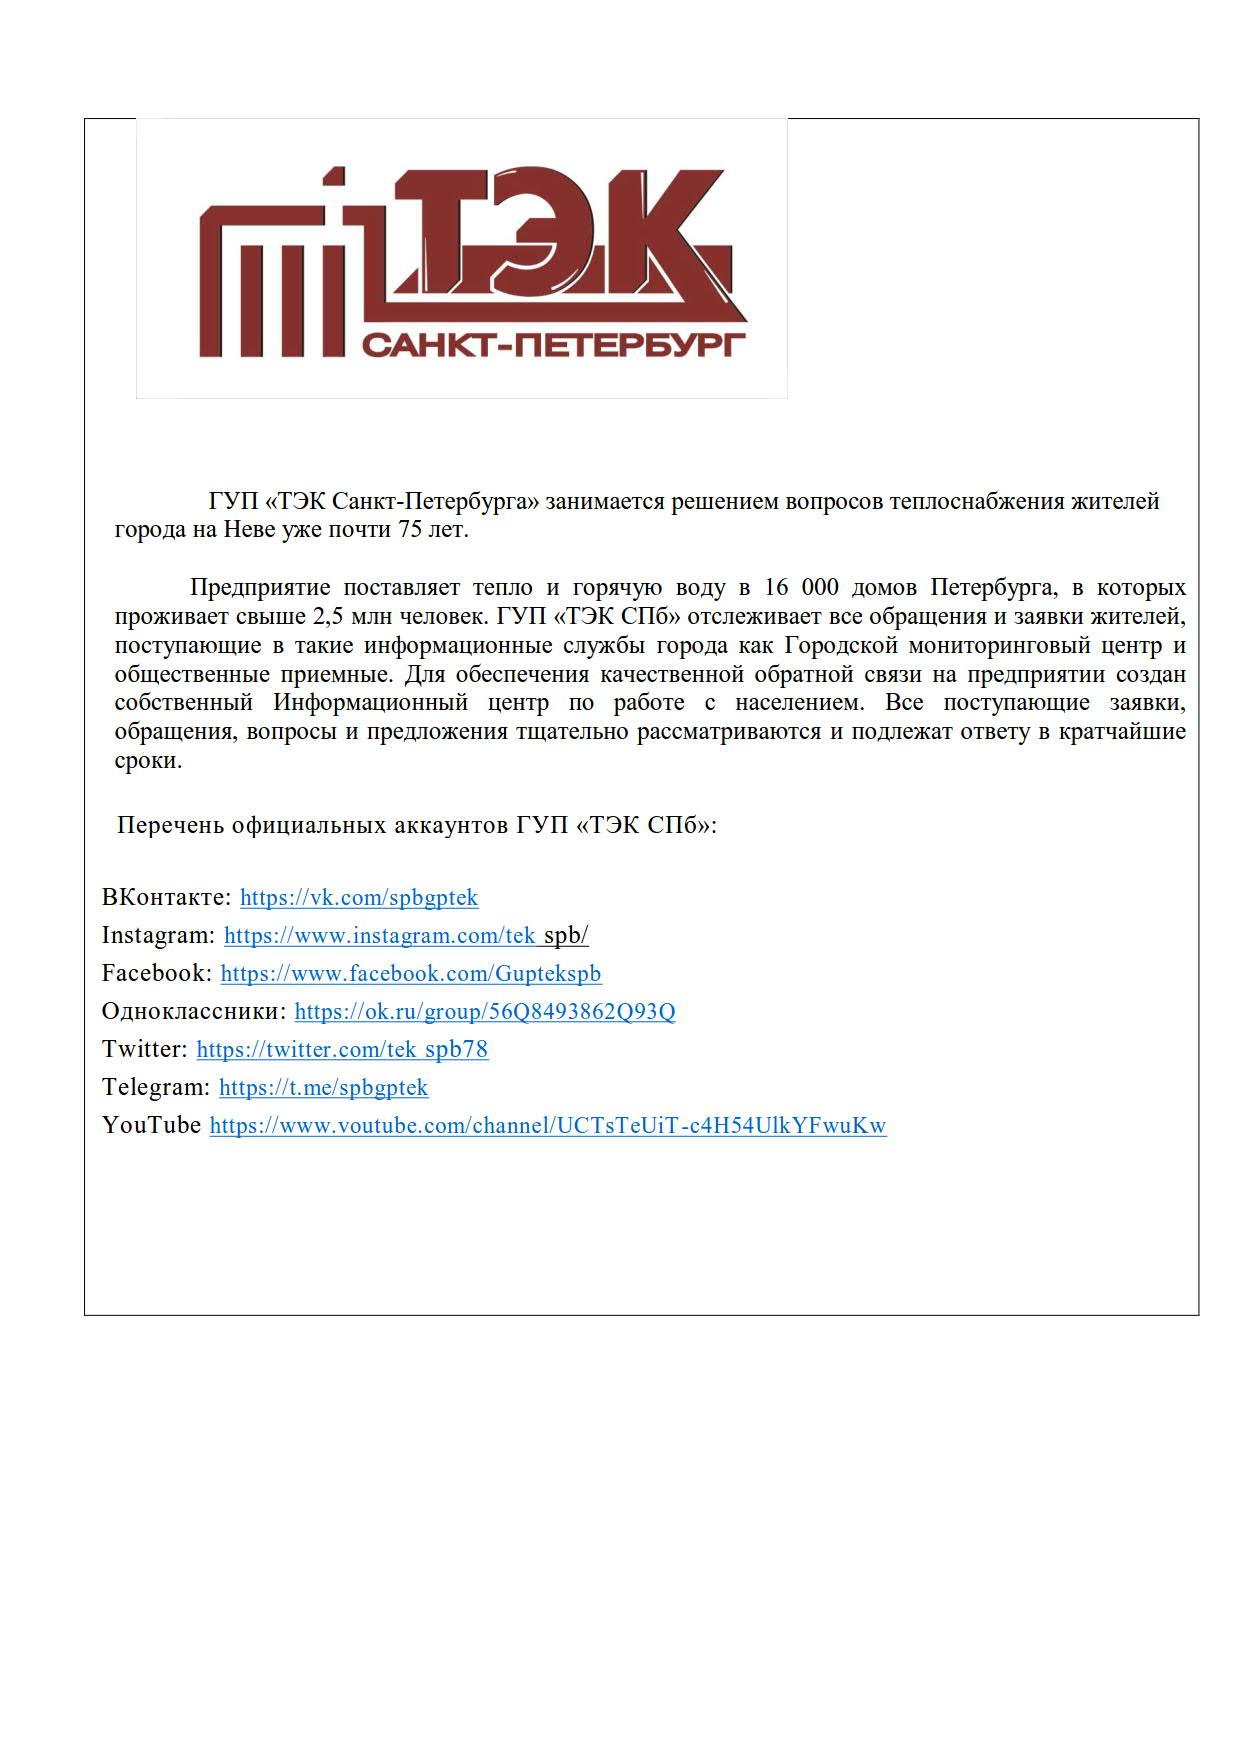 официальные аккаунты ГУП ТЭК_1